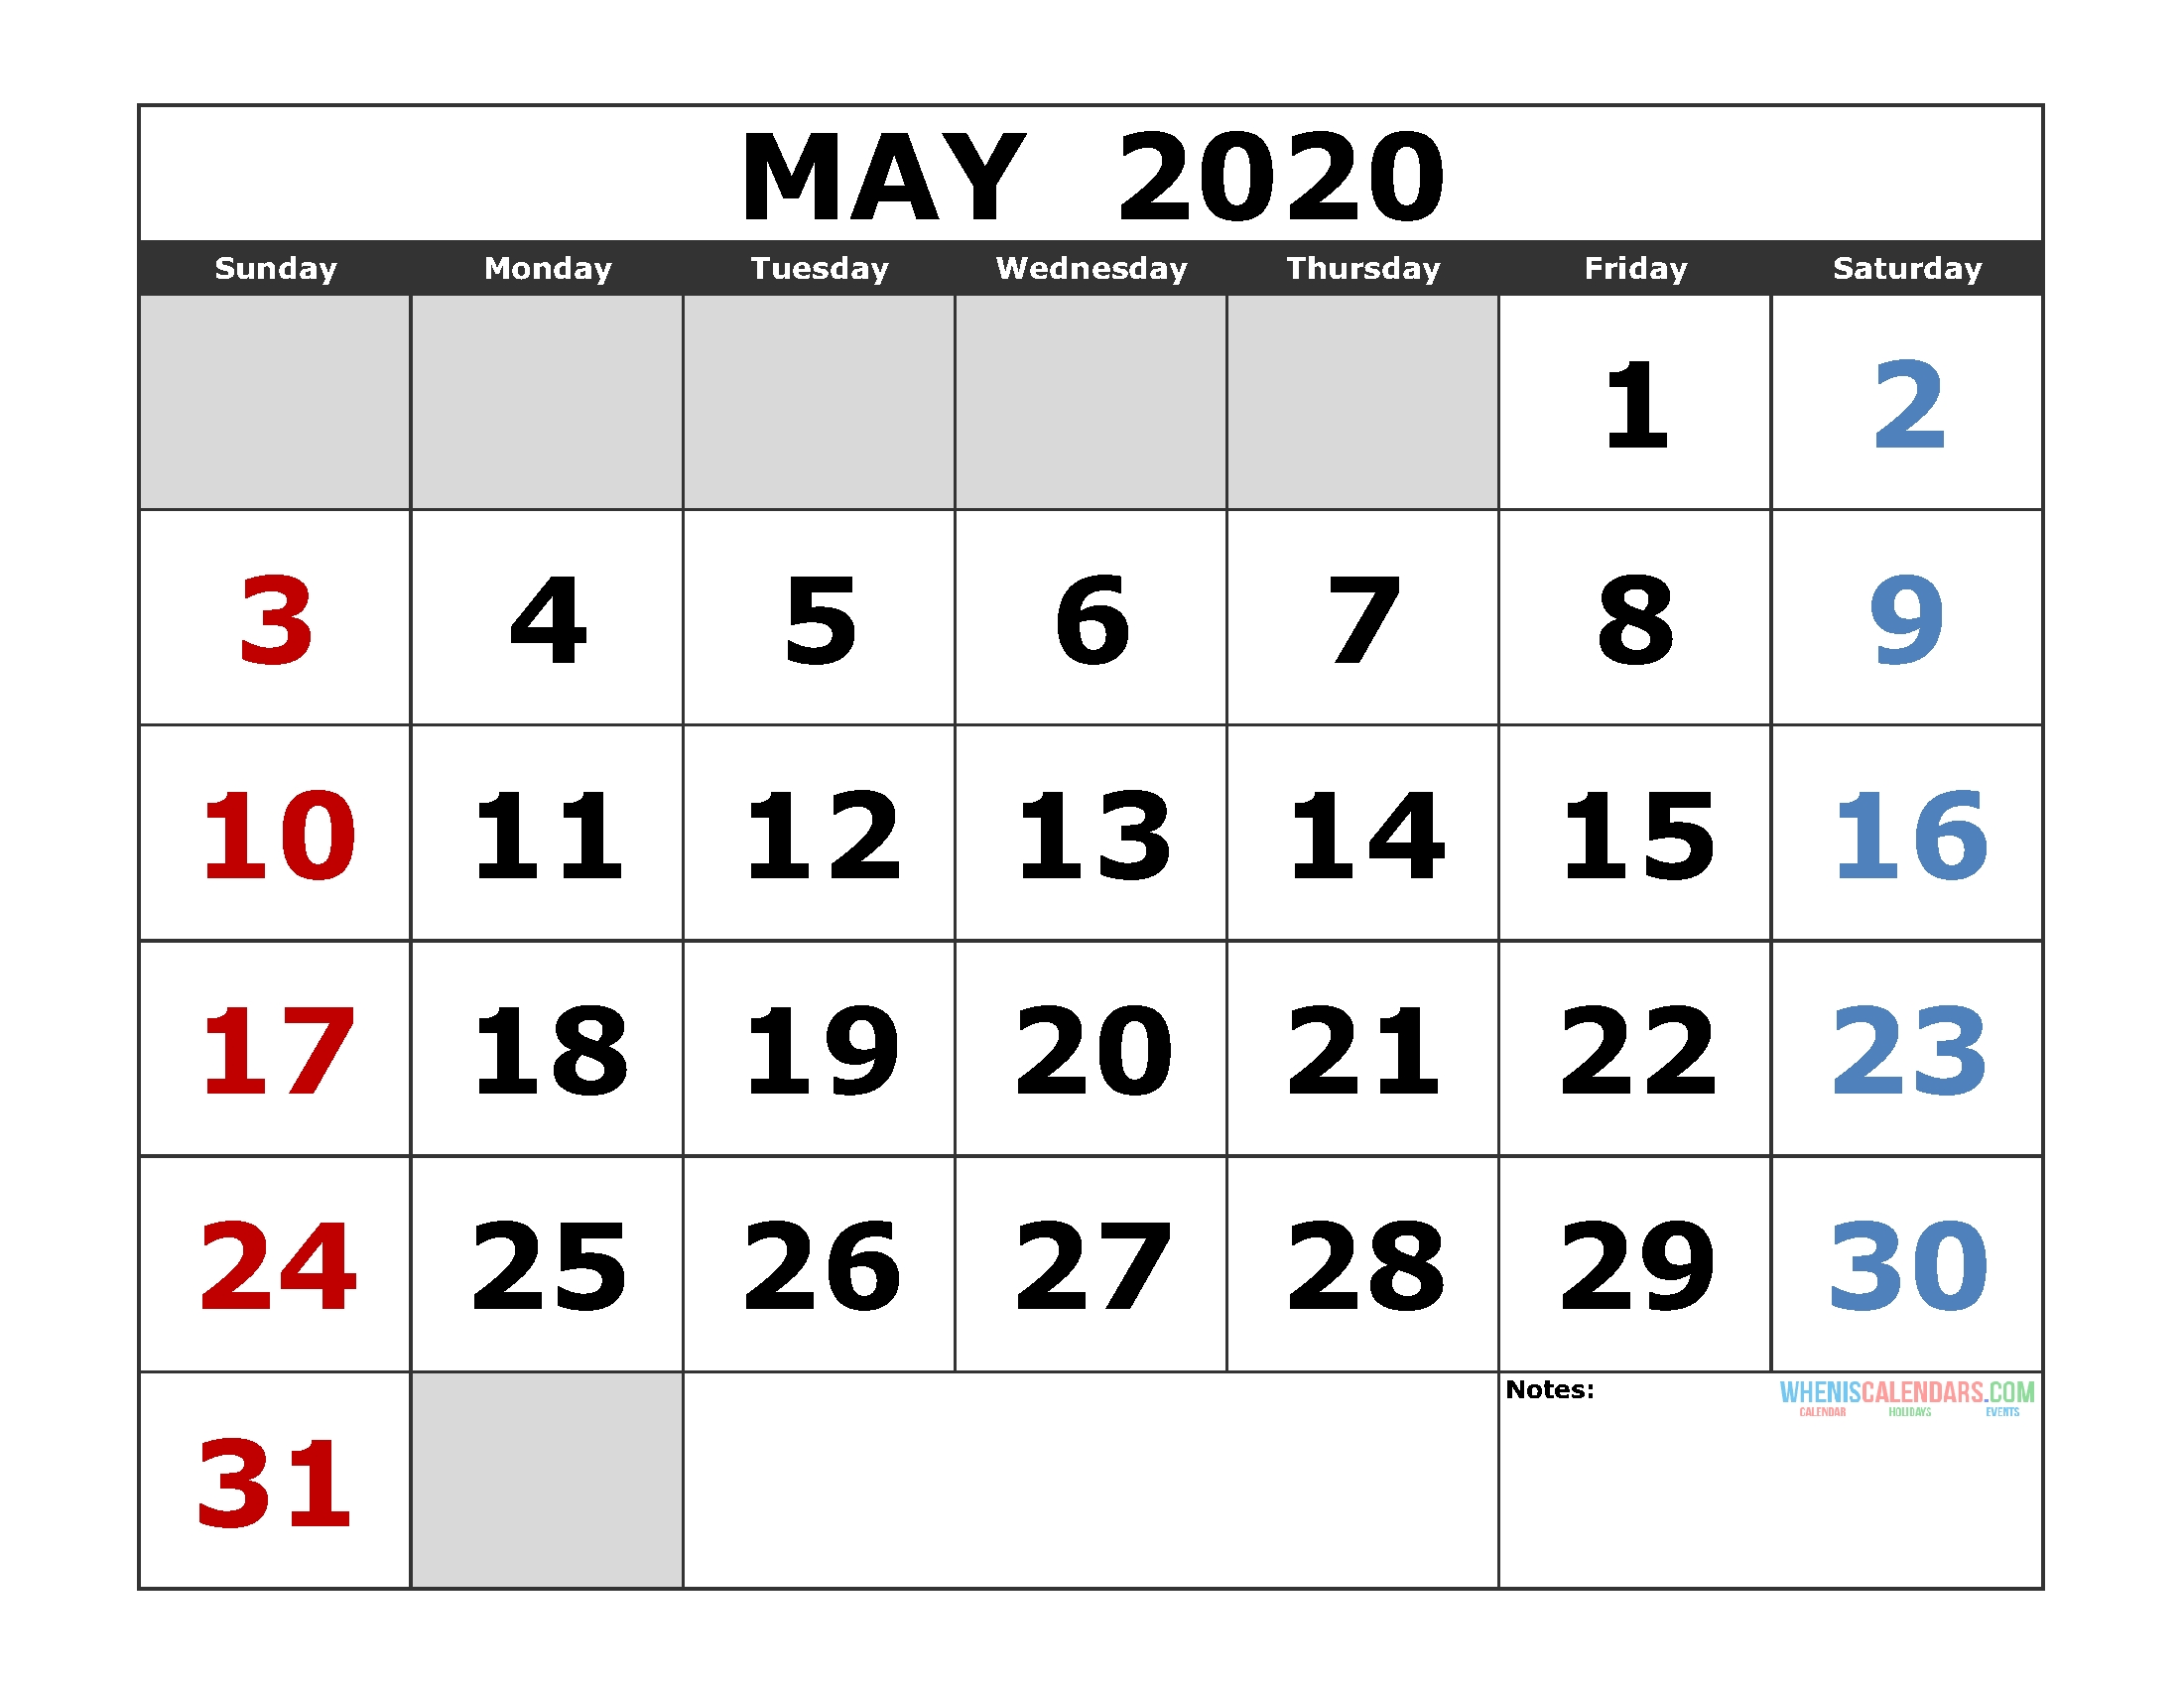 May 2020 Printable Calendar Template Excel, Pdf, Image [Us